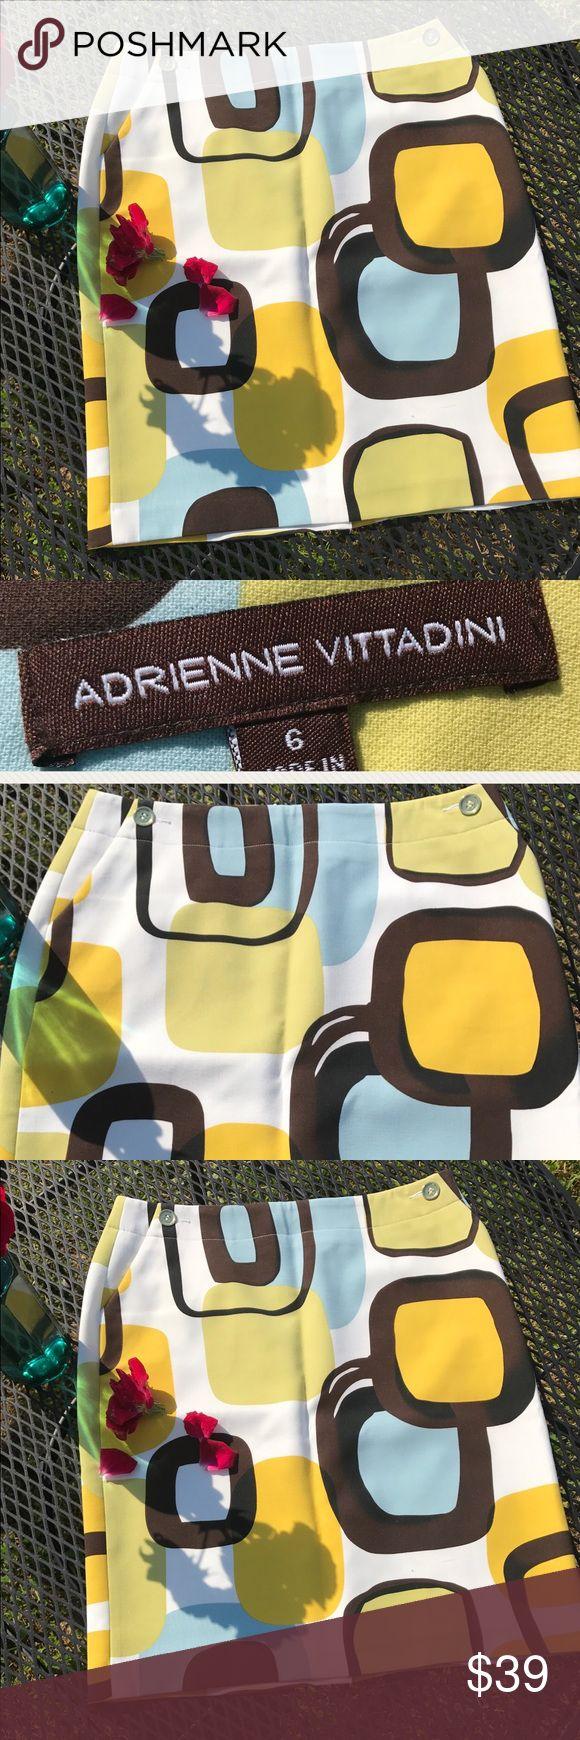 Adrienne Vittadini Bold Geometric Print Skirt SZ 6 Adrienne Vittadini Bold Geometric Print Skirt SZ 6 Adrienne Vittadini Skirts